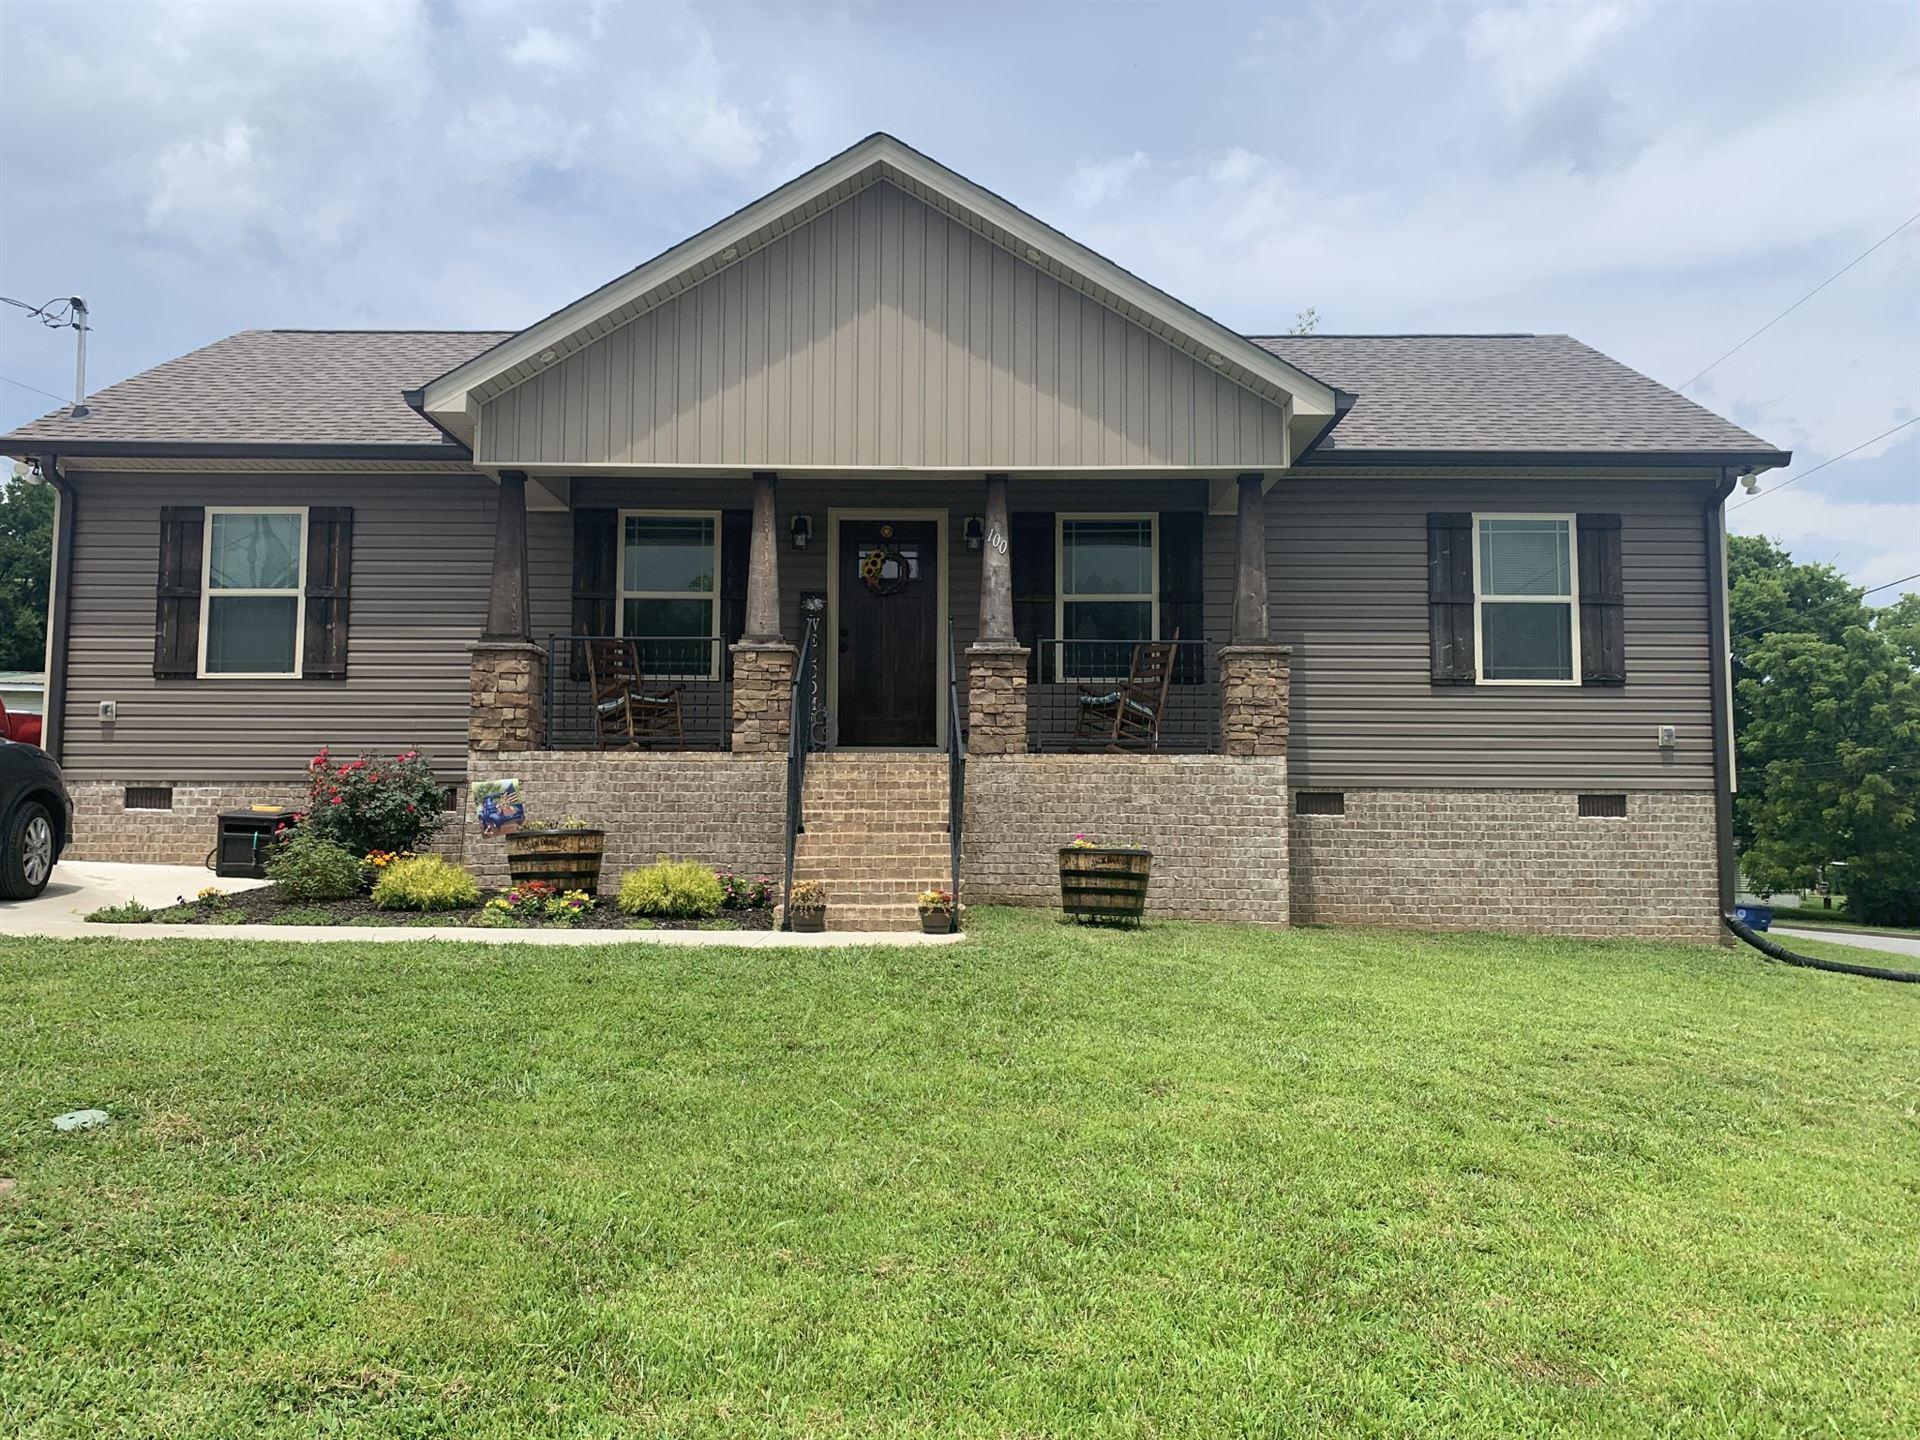 100 Lexington Cv, Shelbyville, TN 37160 - MLS#: 2276362